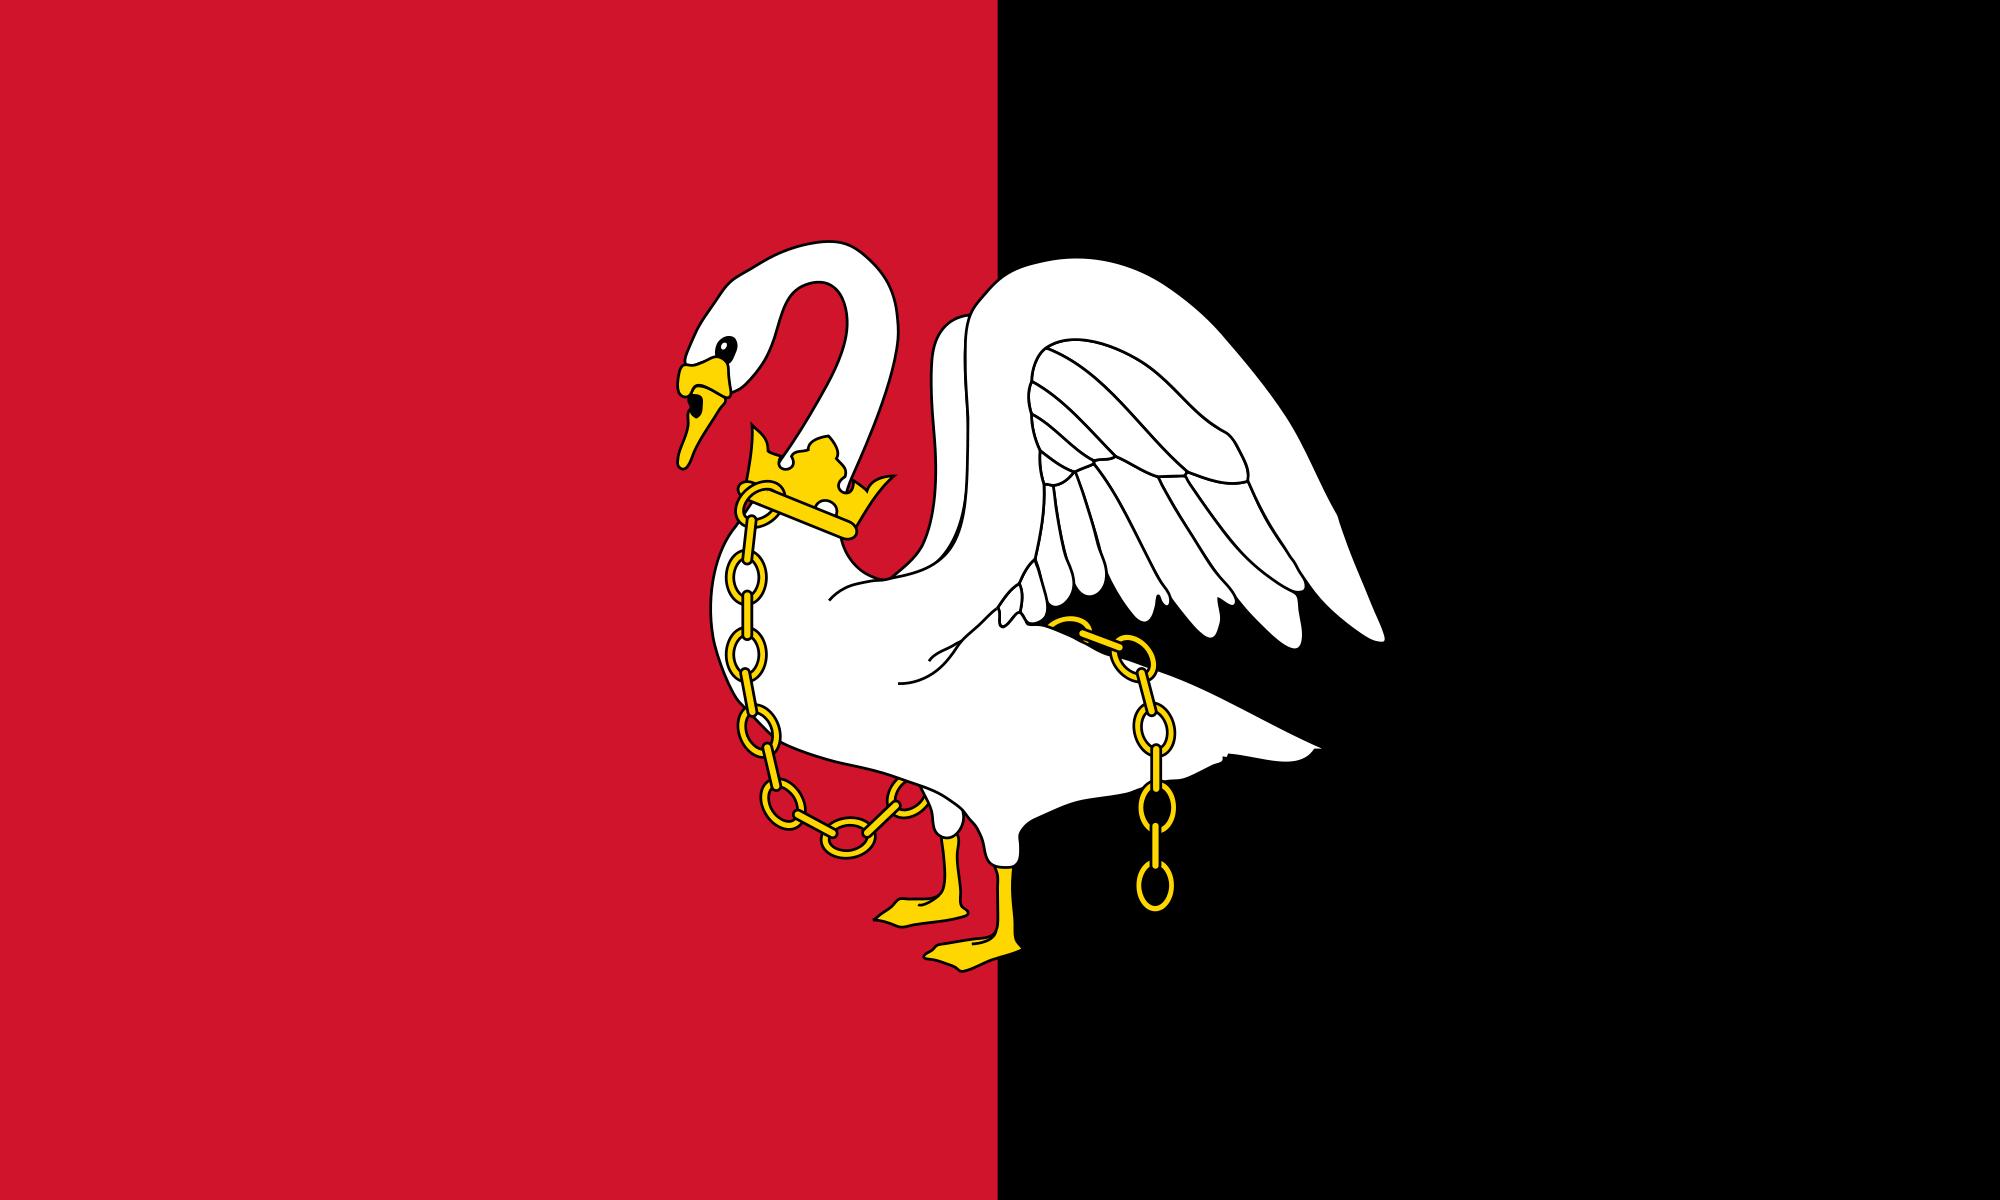 Buckinghamshire County England Flag Sticker Sheet